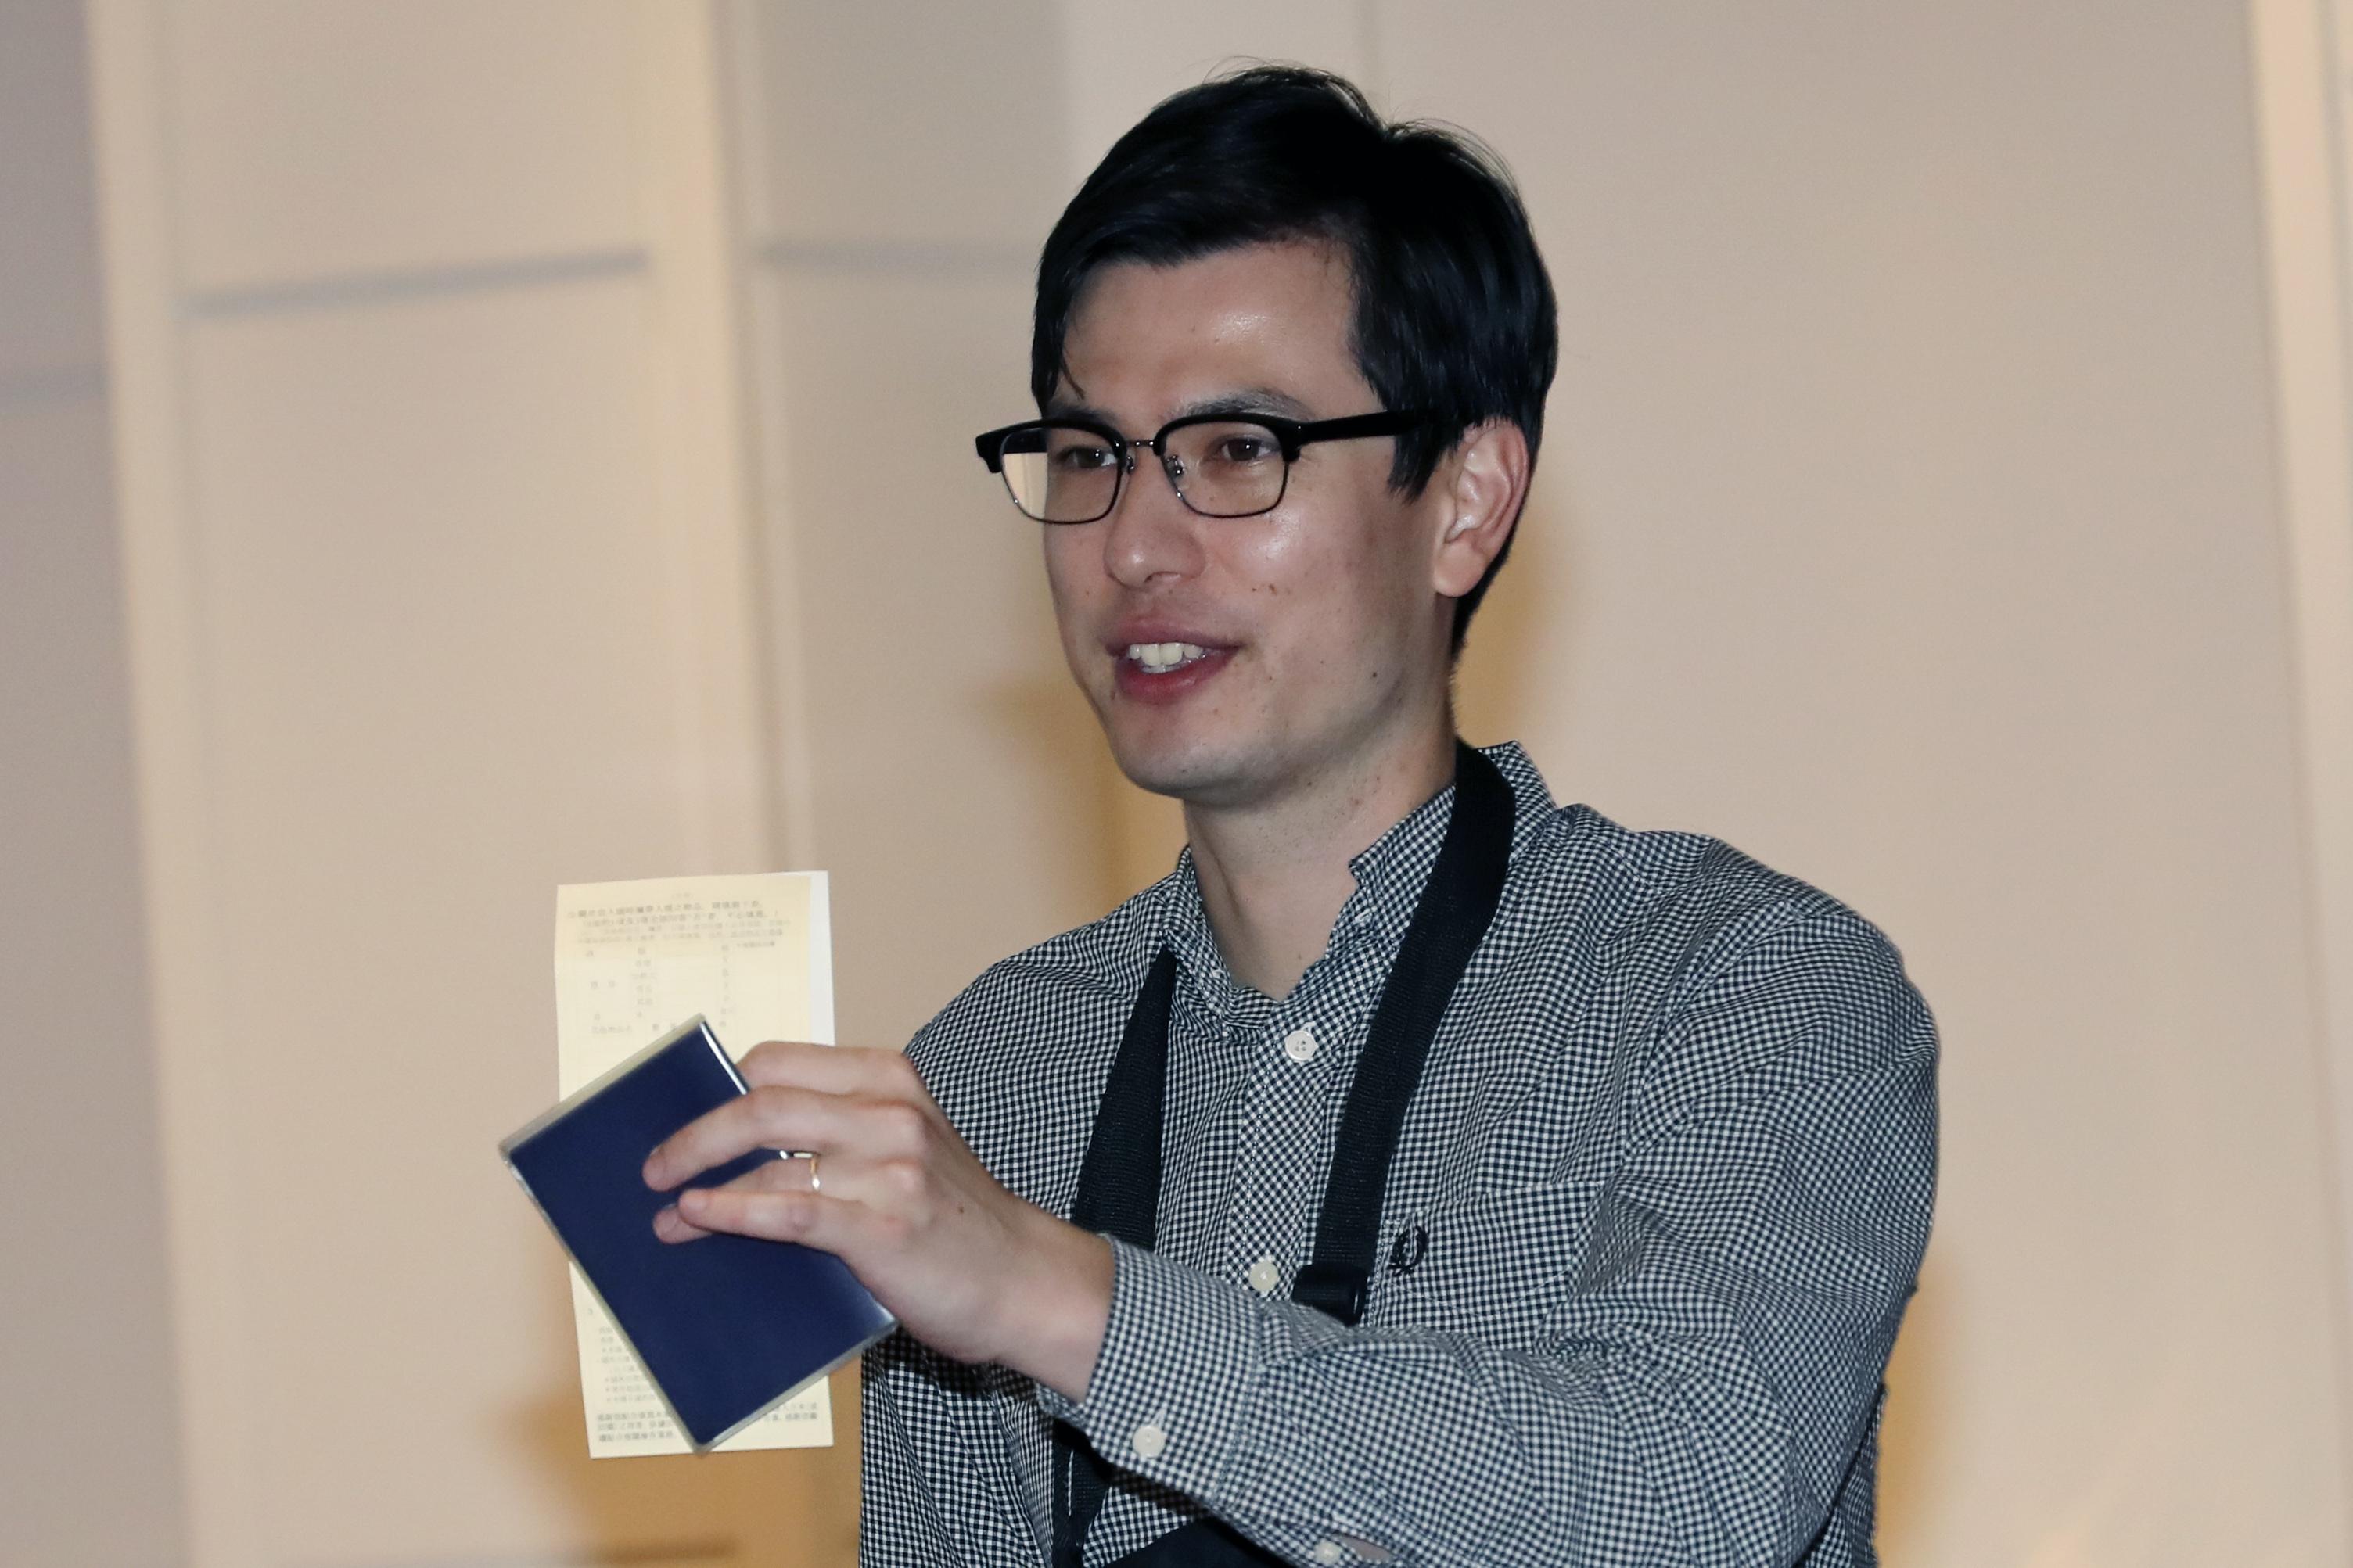 Australian student released in North Korea says Im OK